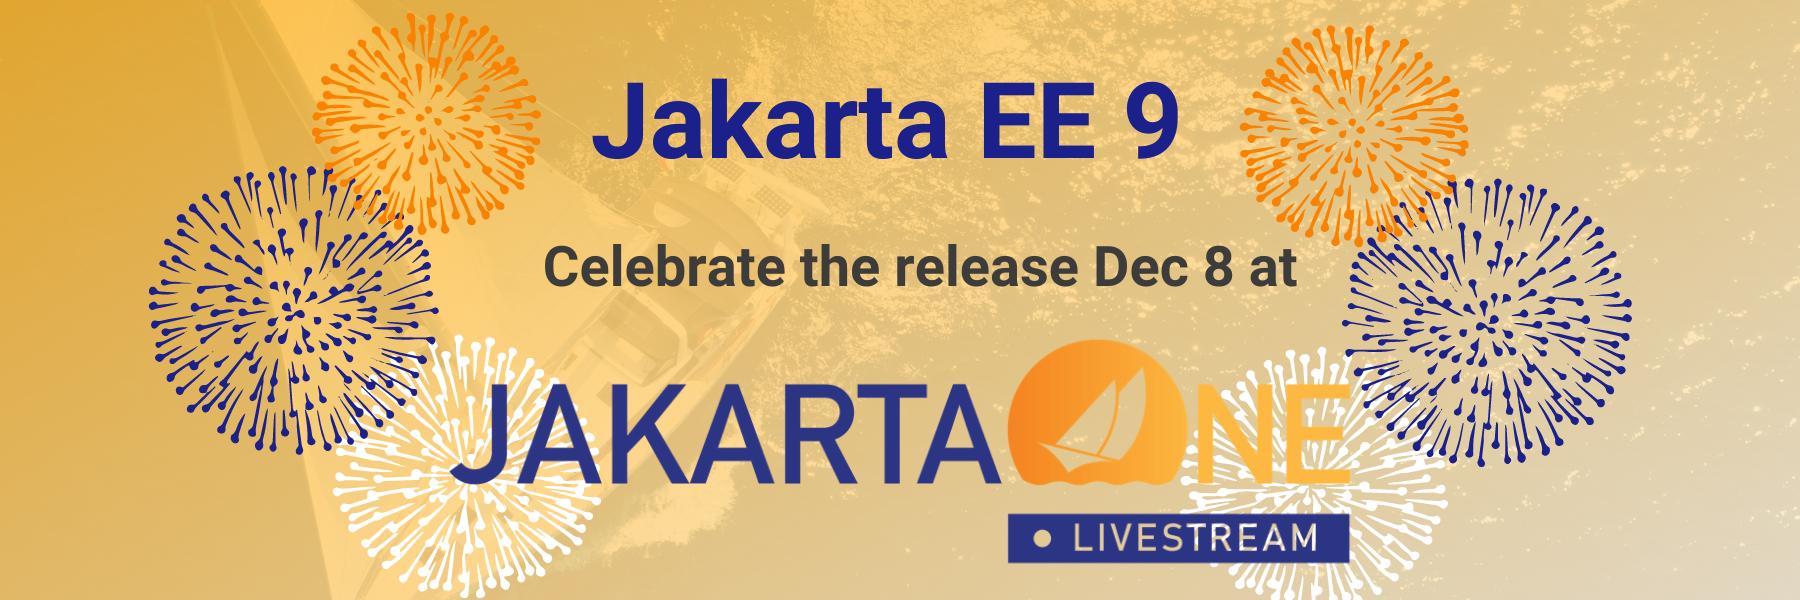 JakartaOne Livestream 2020